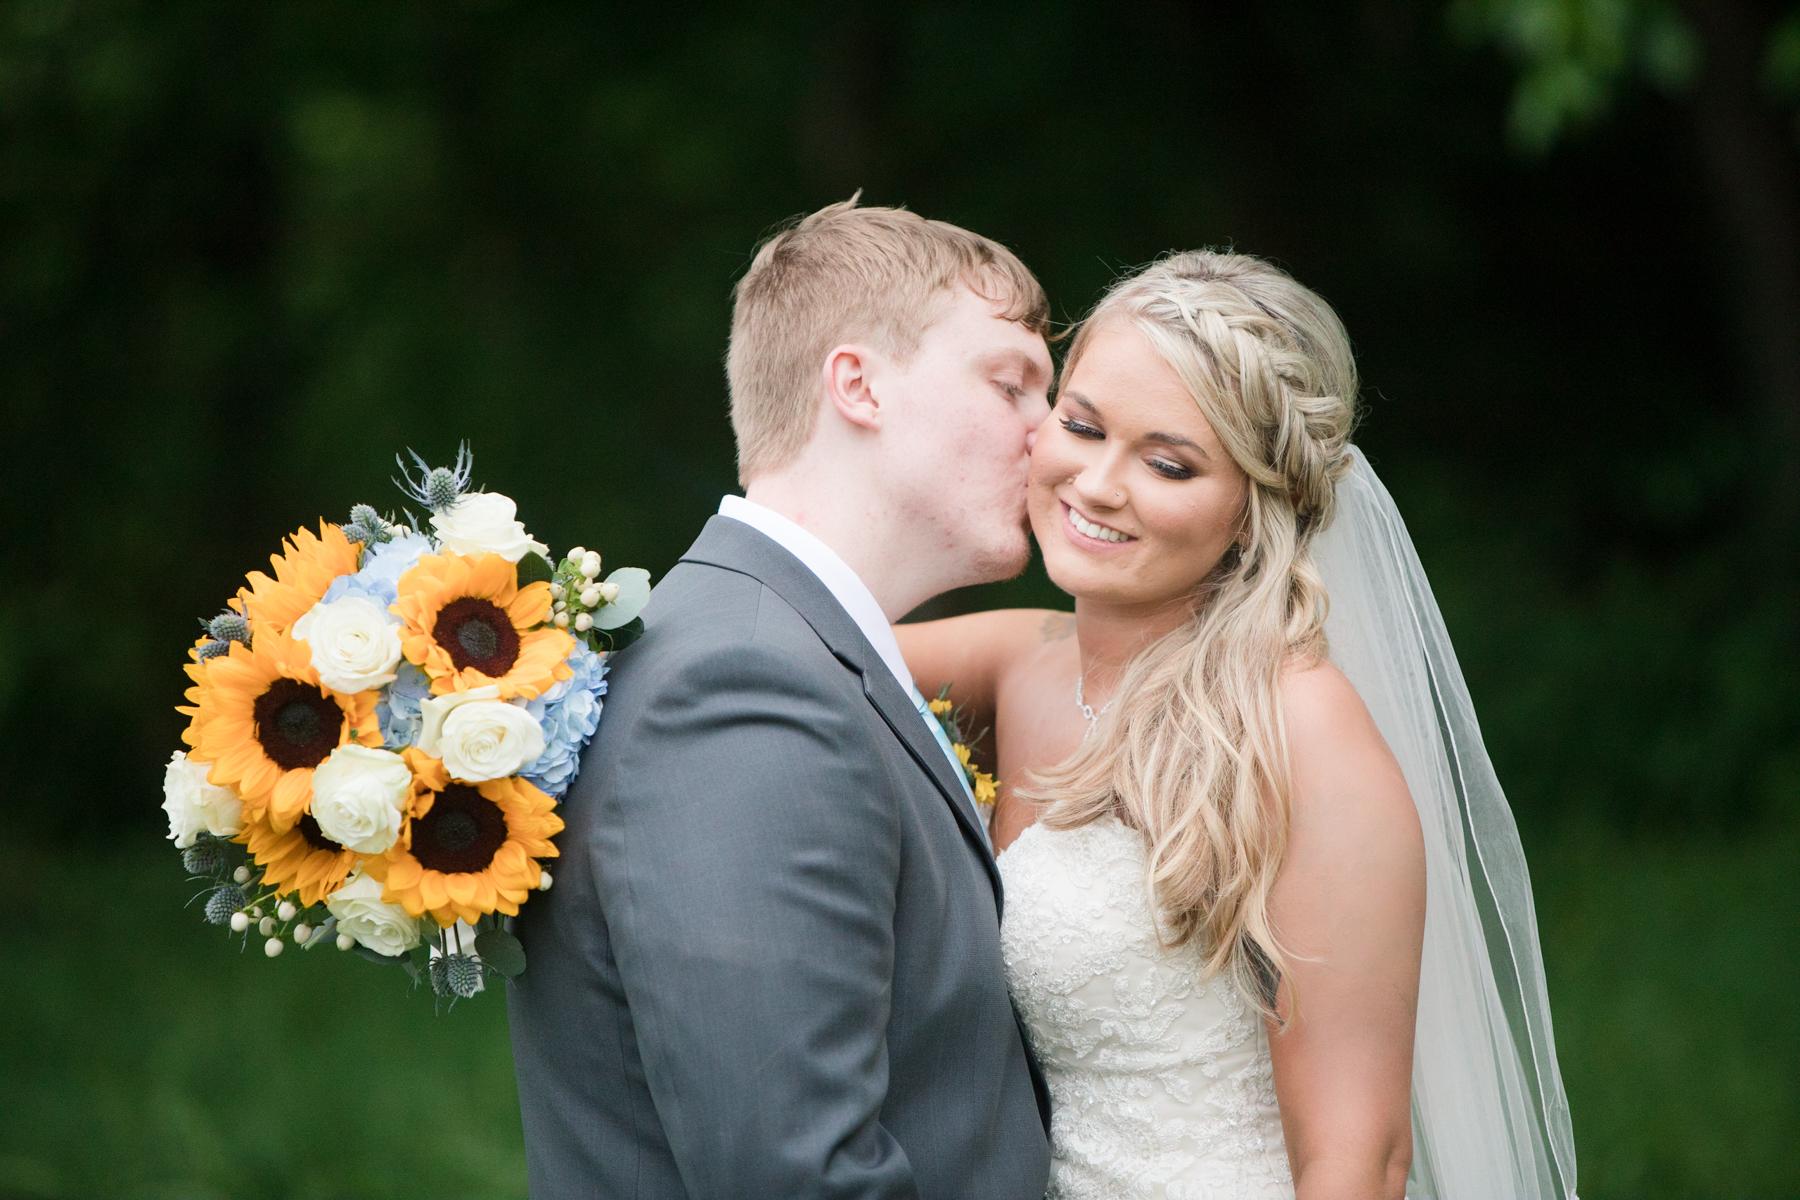 The-venue-at-white-oak-farms-wedding-nashville-wedding-photographers-0283.jpg